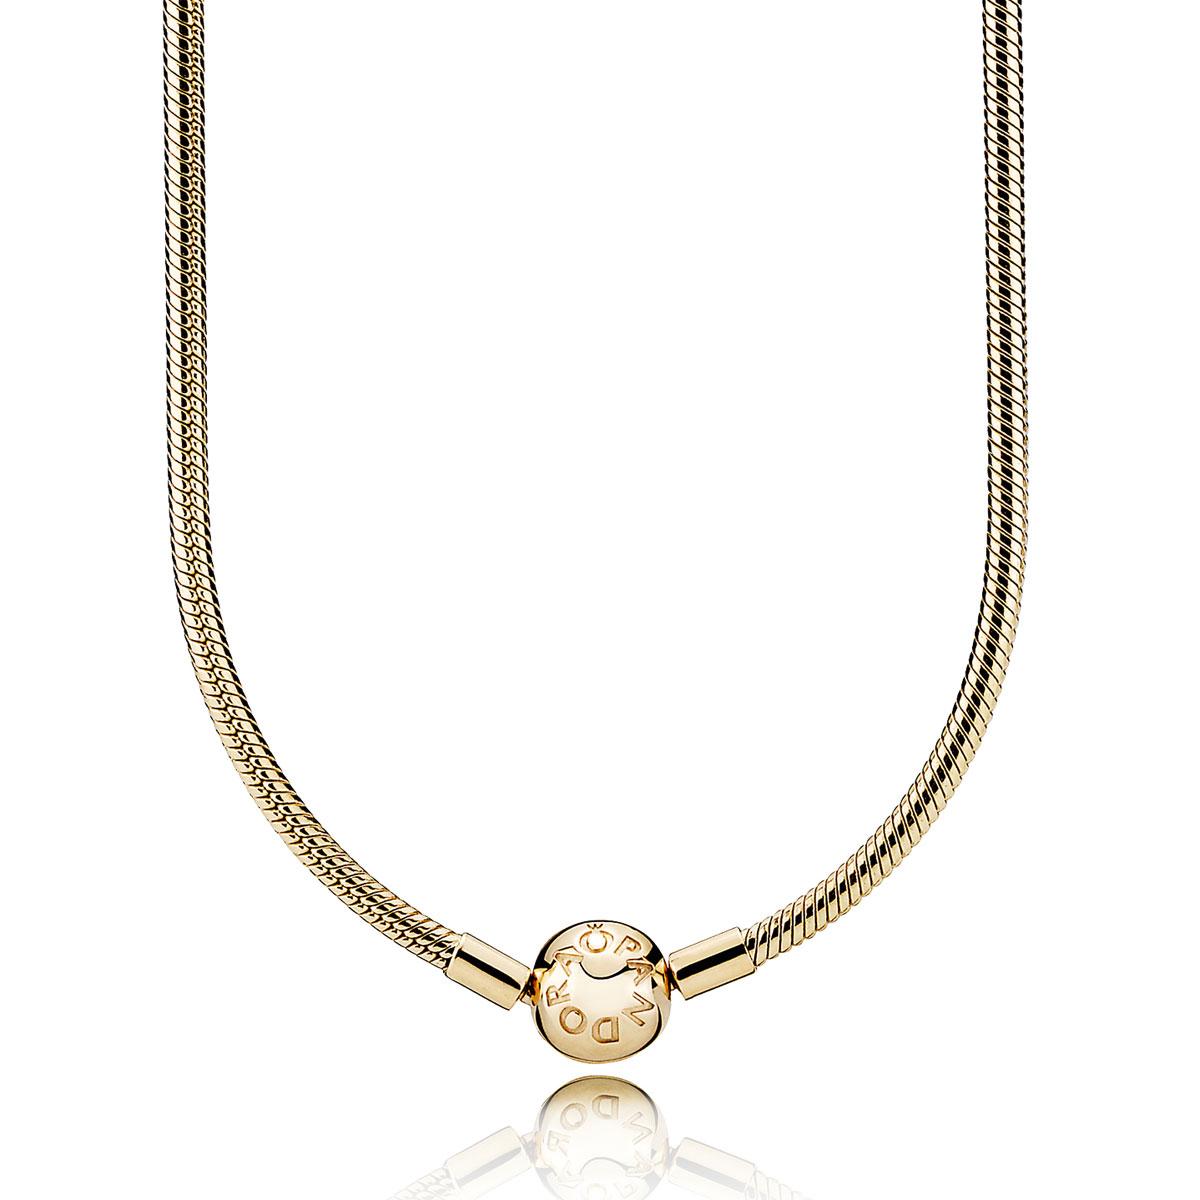 Pandora necklaces pancharmbracelets pandora 14k gold charm necklace clasp aloadofball Gallery